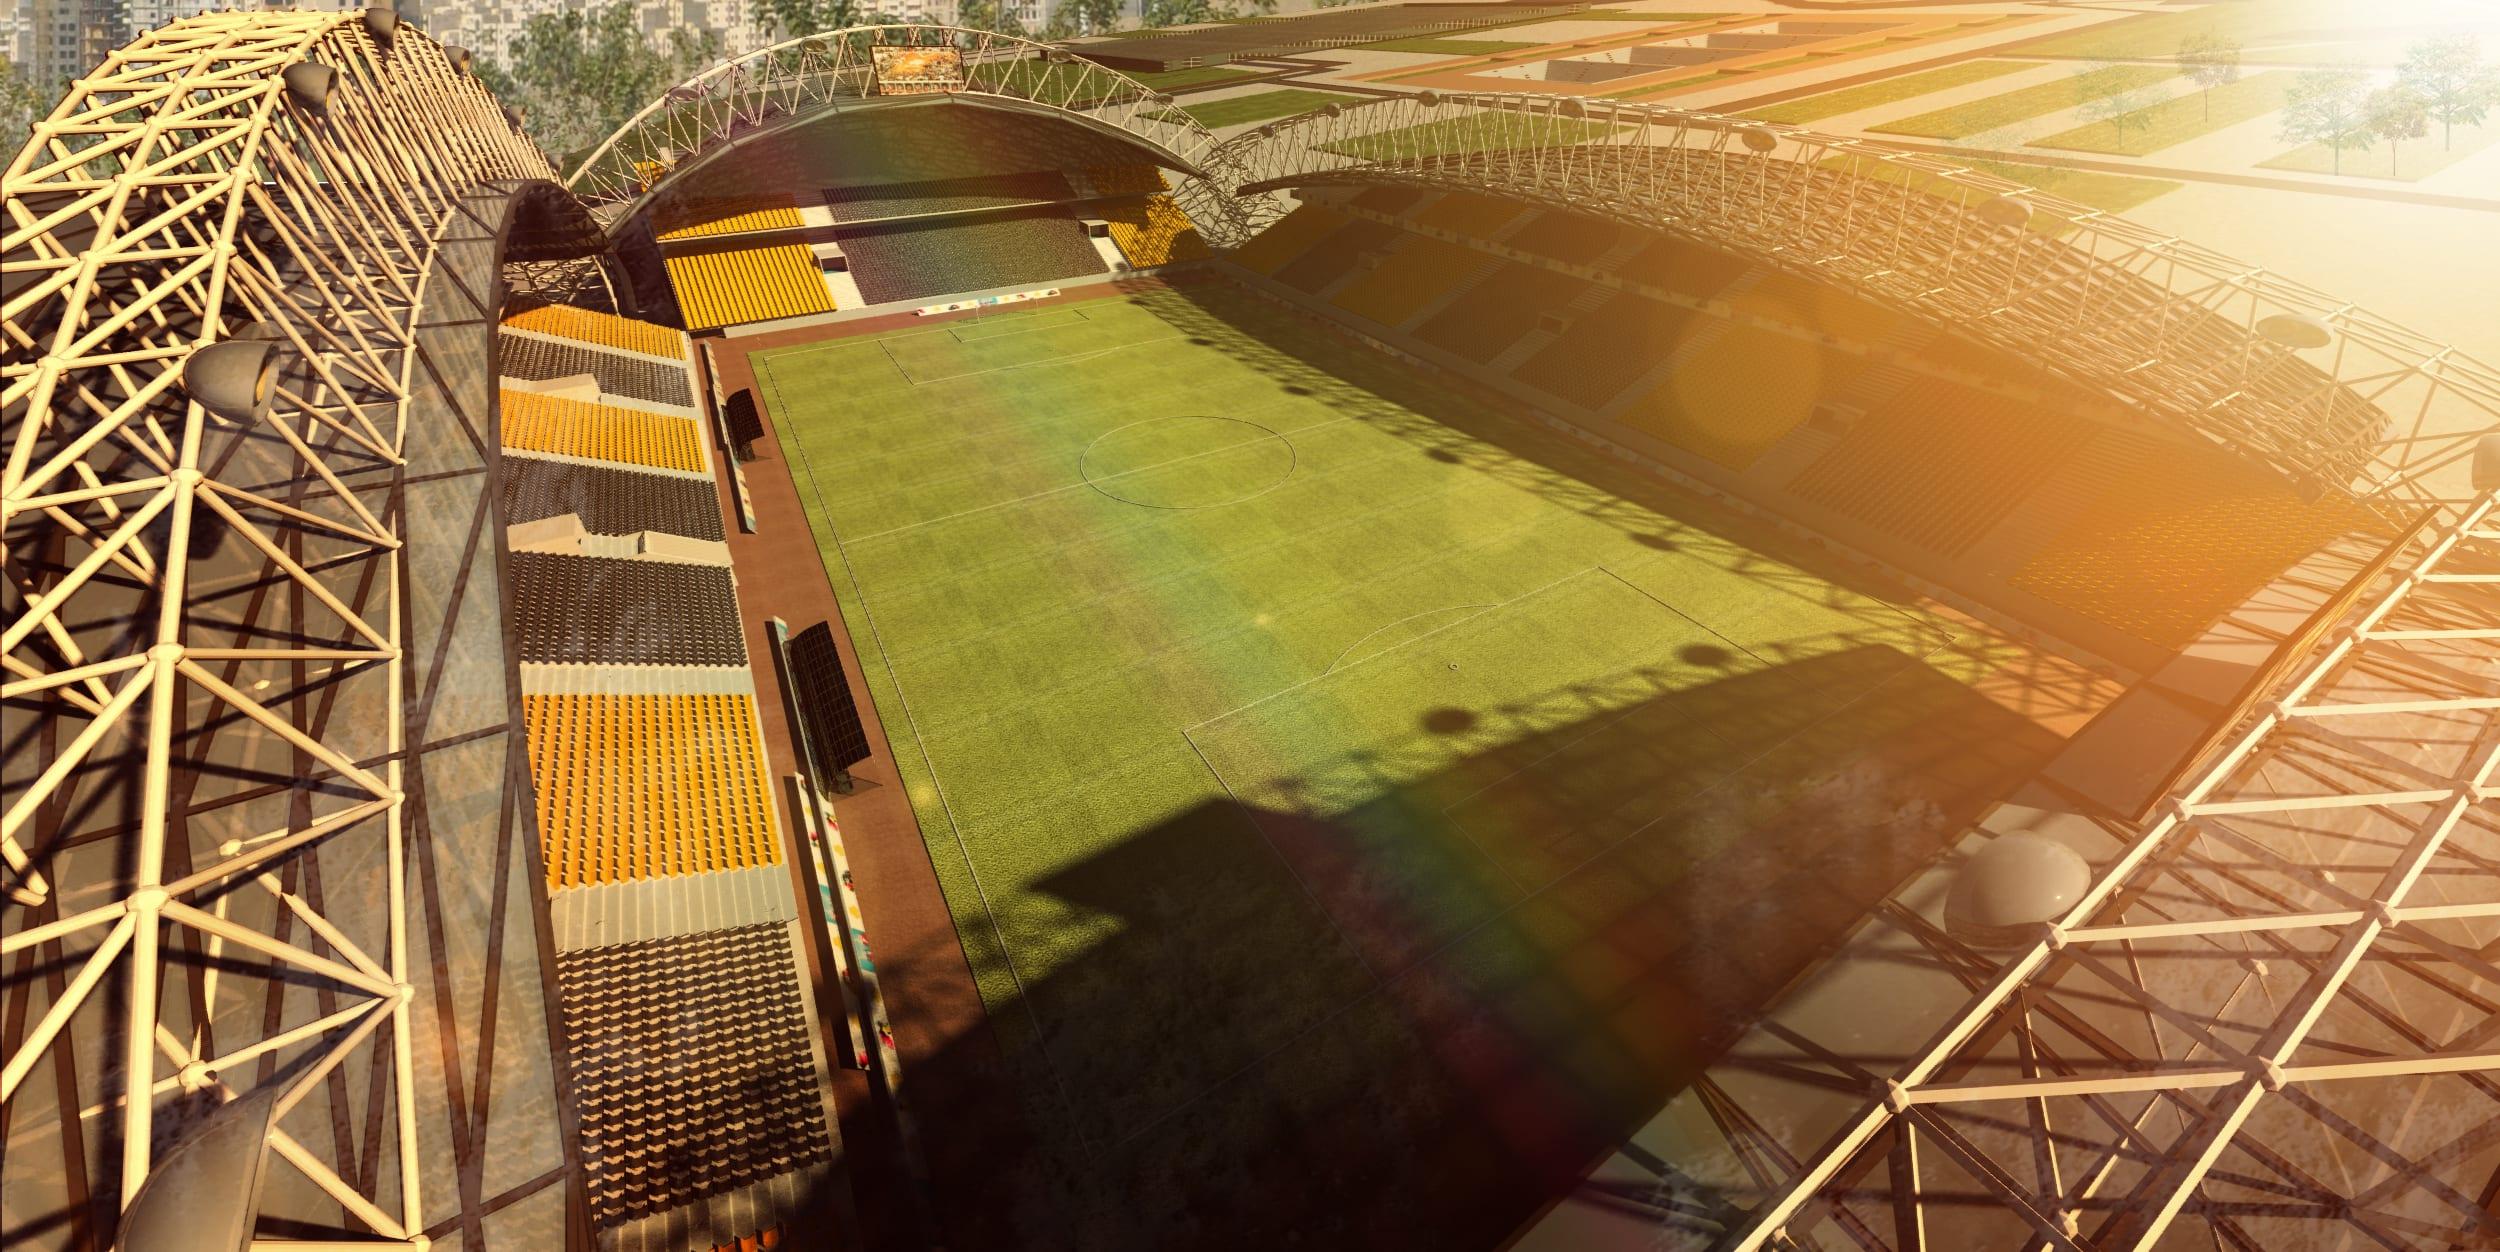 Hasil gambar untuk The perfect sports building